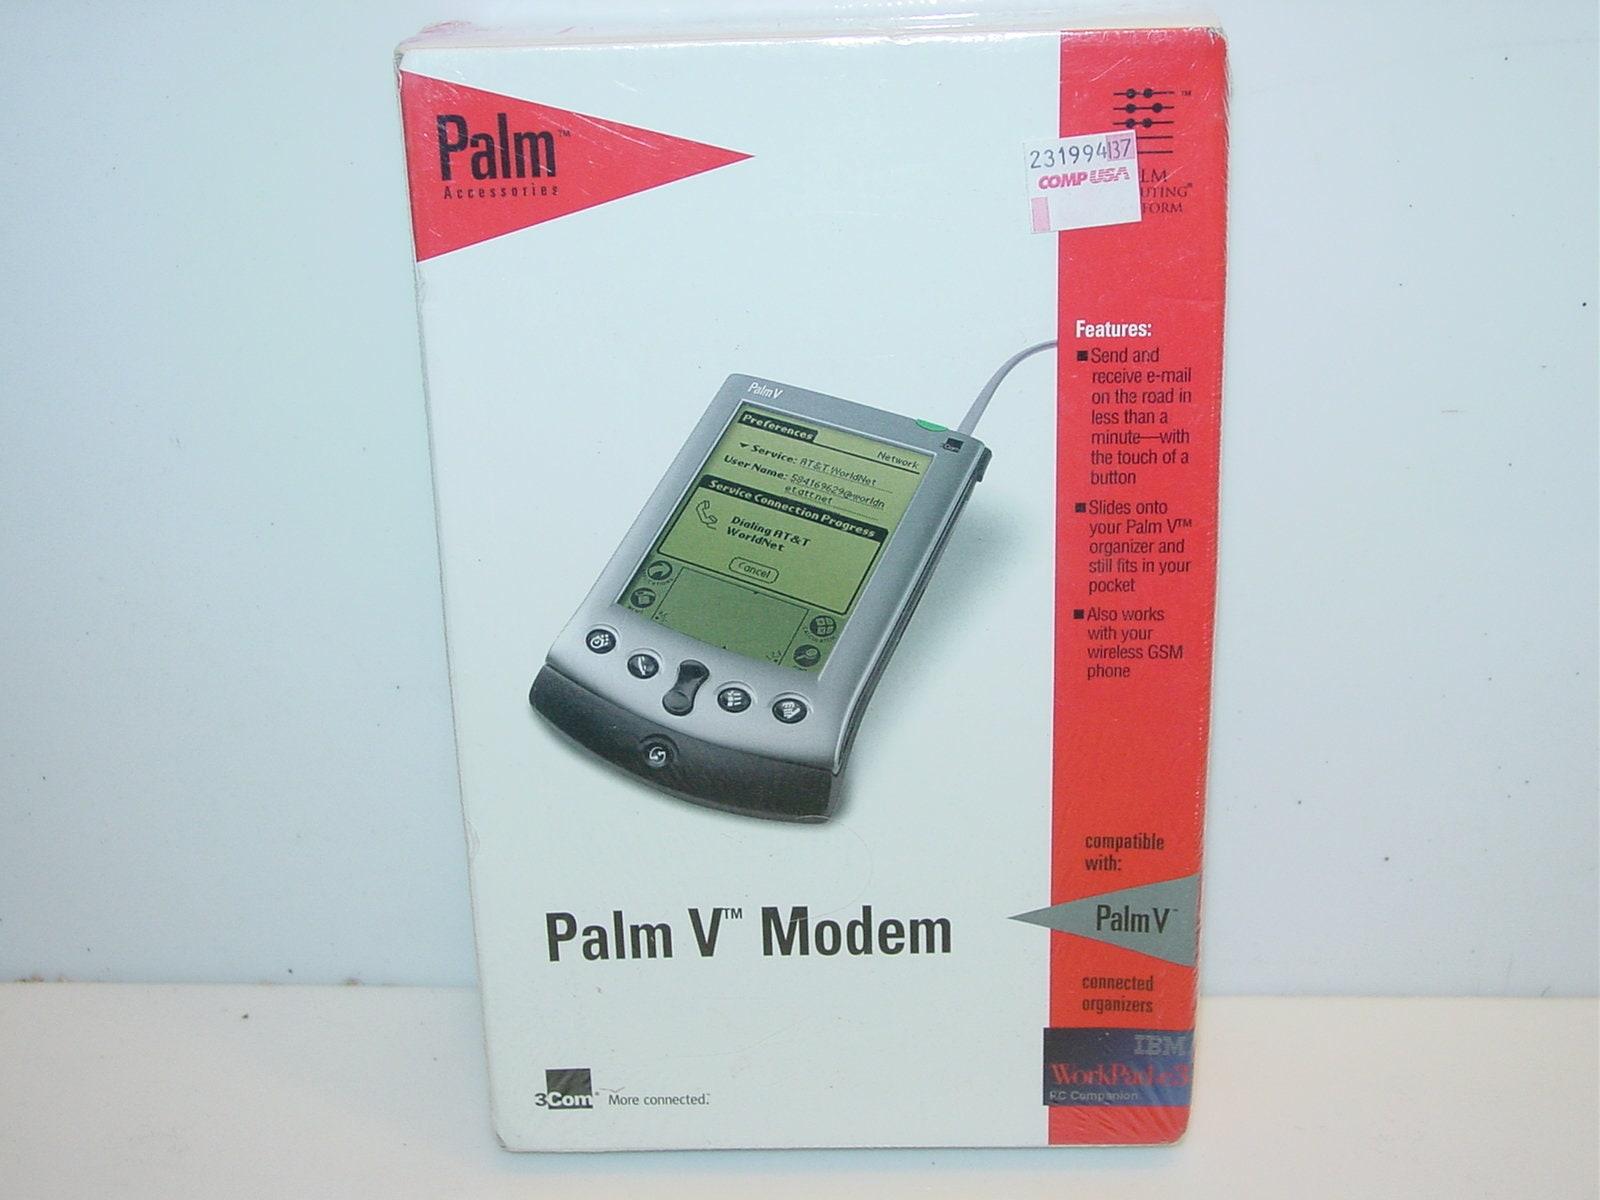 3Com Genuine Palm V Modem 10401U IBM WordPad c3 New Sealed 10401